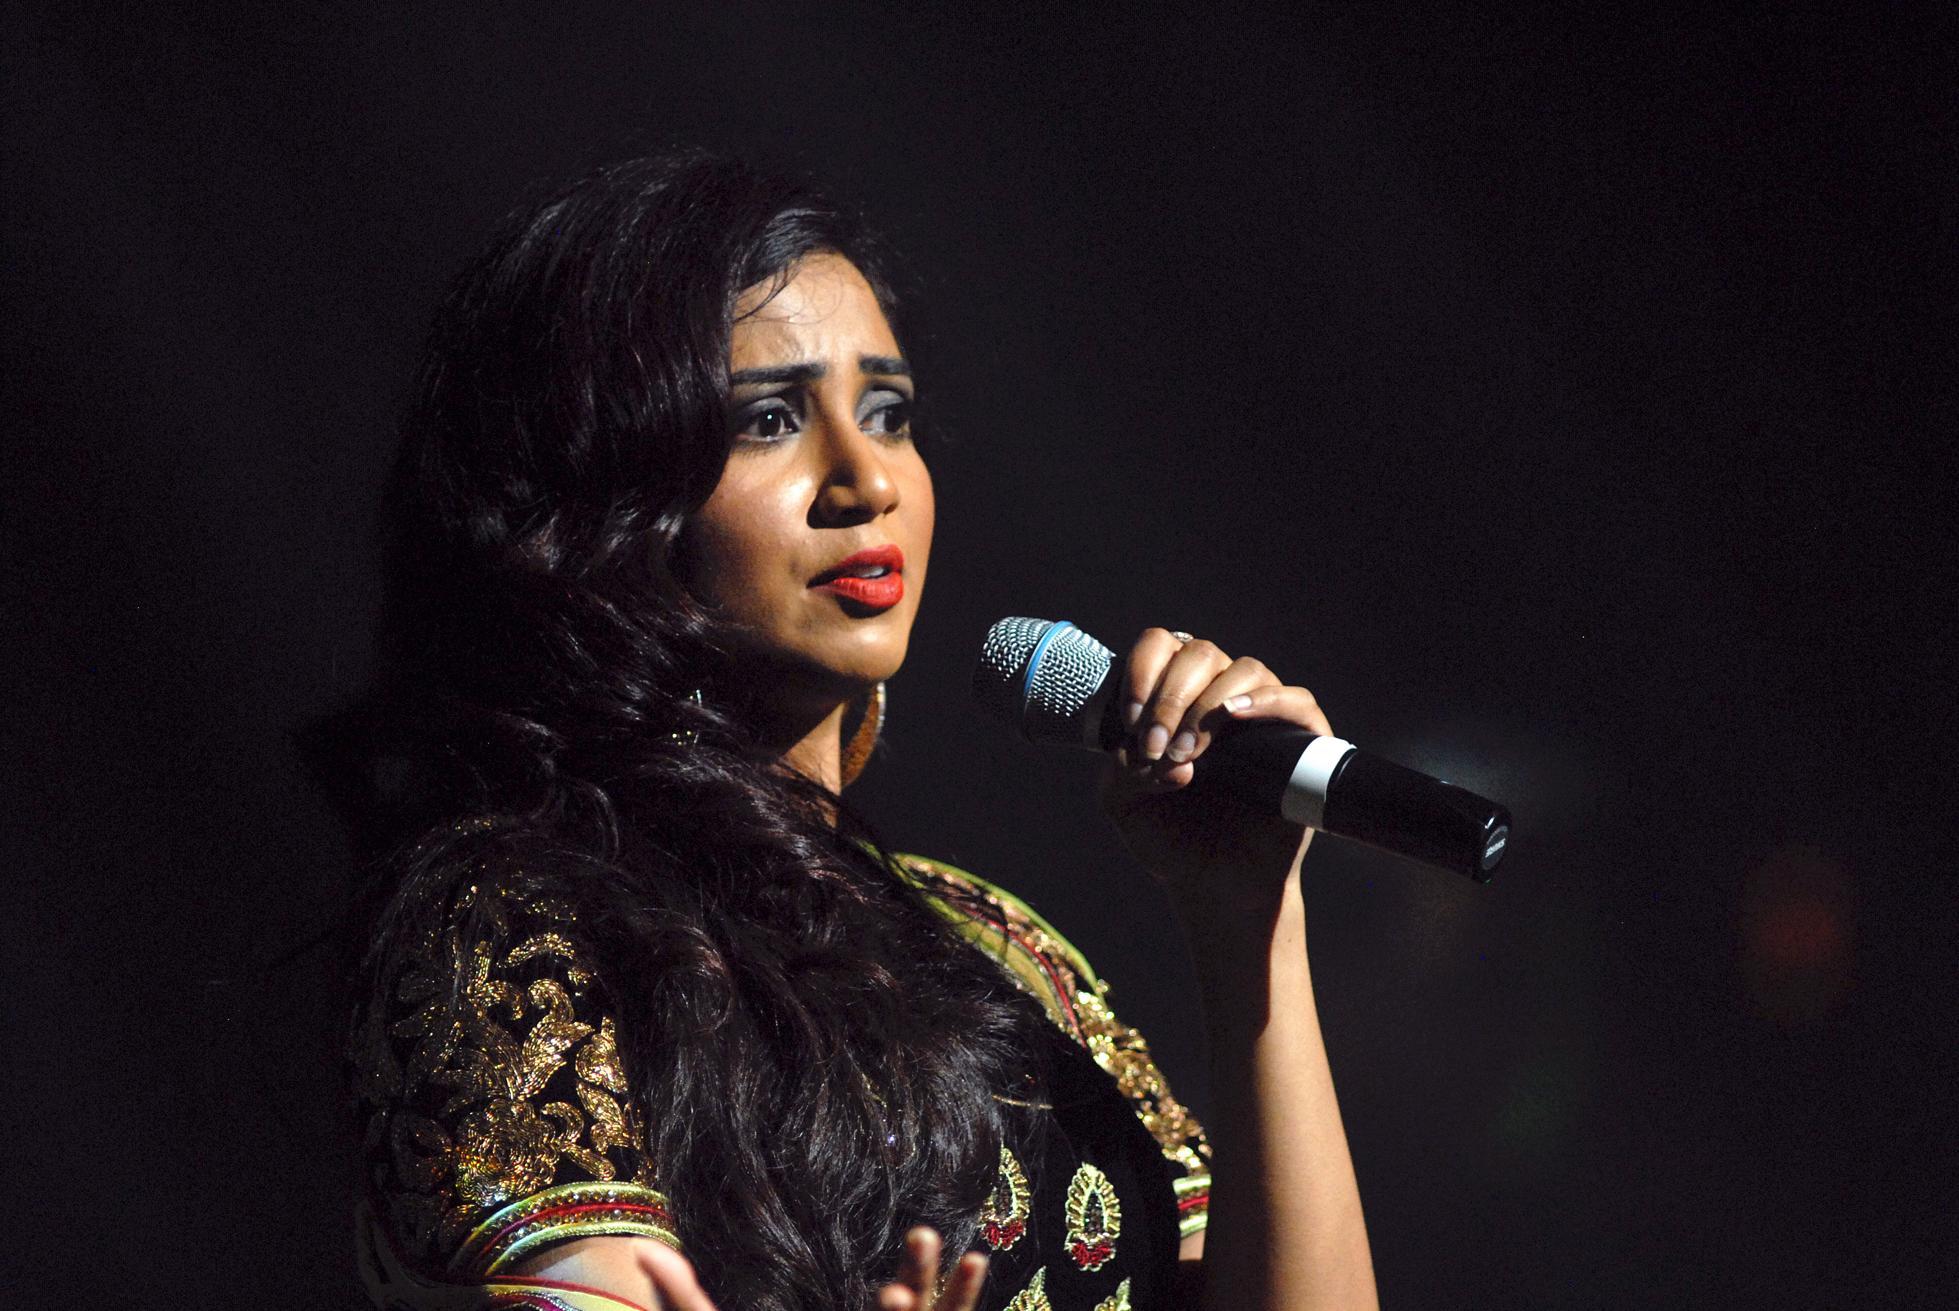 Shreya Ghoshal In concert